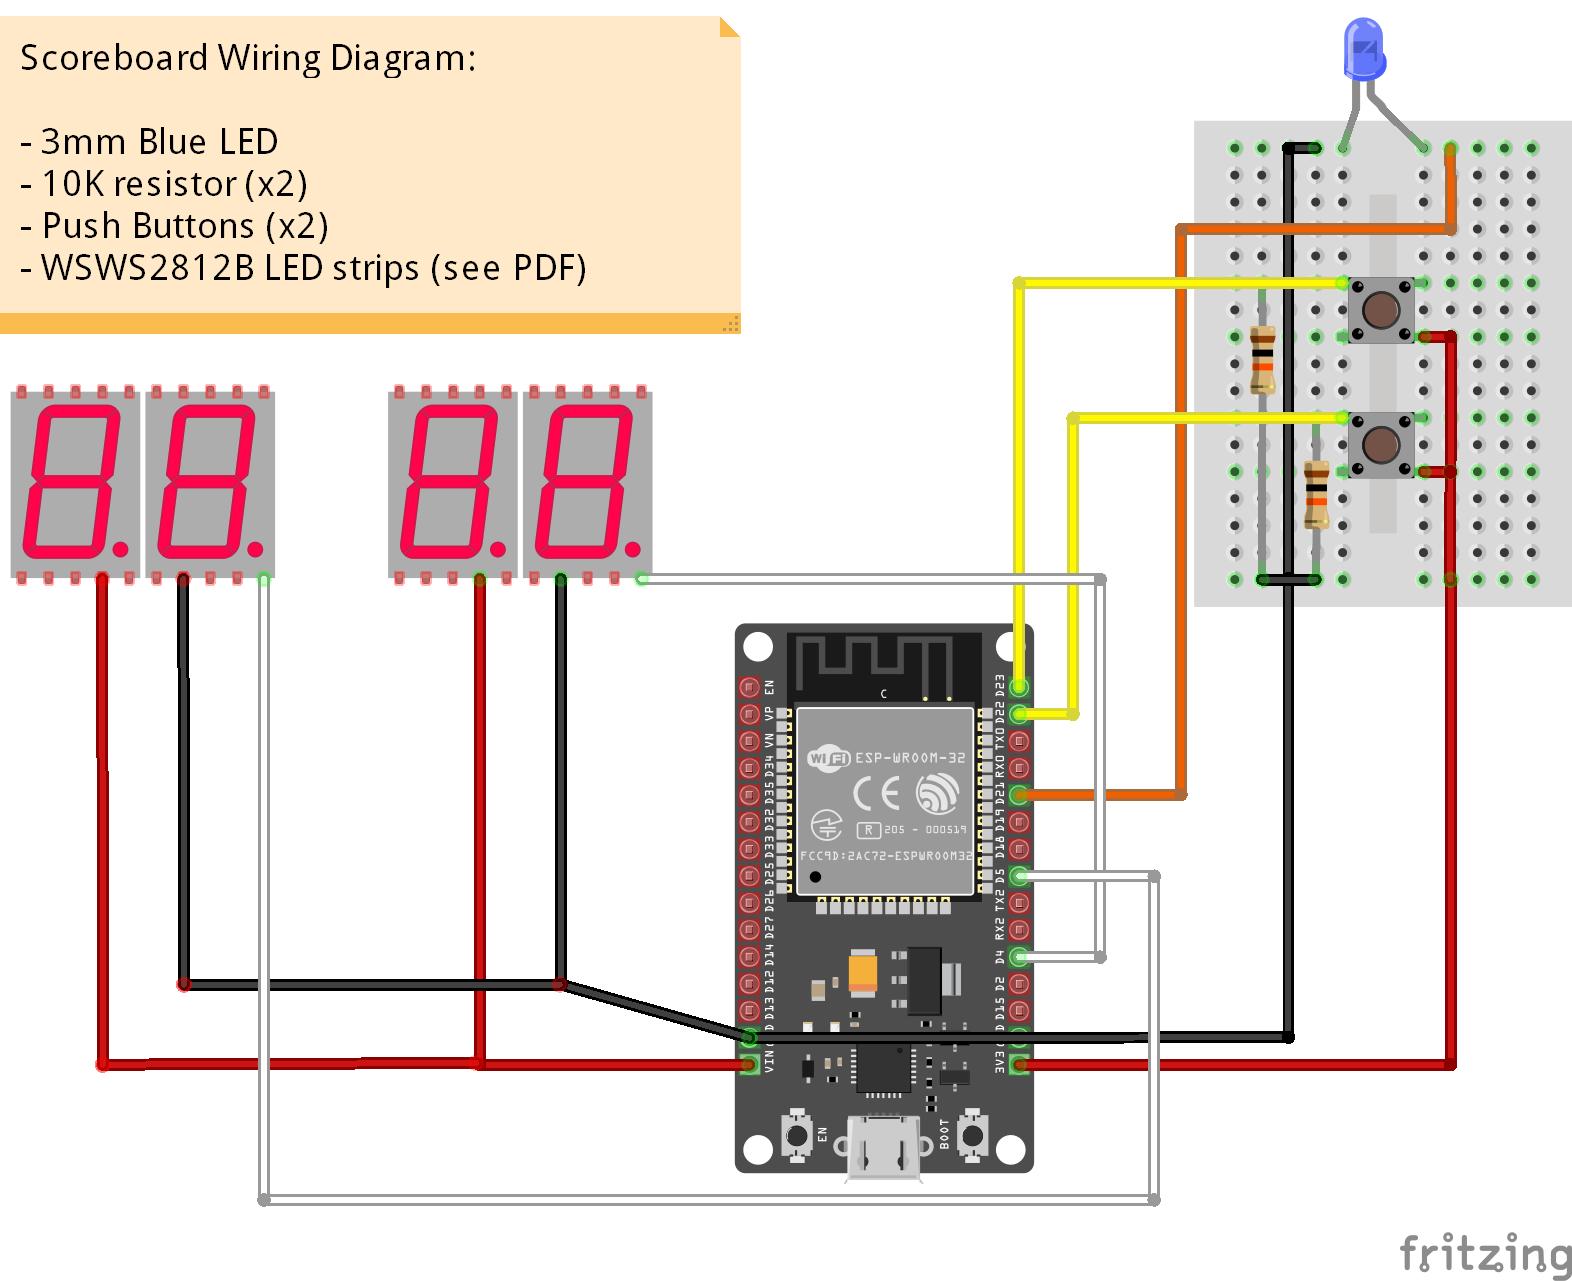 [QMVU_8575]  ESP32 - 7 Segment Scoreboard - Hackster.io | Scoreboard Wiring Diagrams |  | Hackster.io